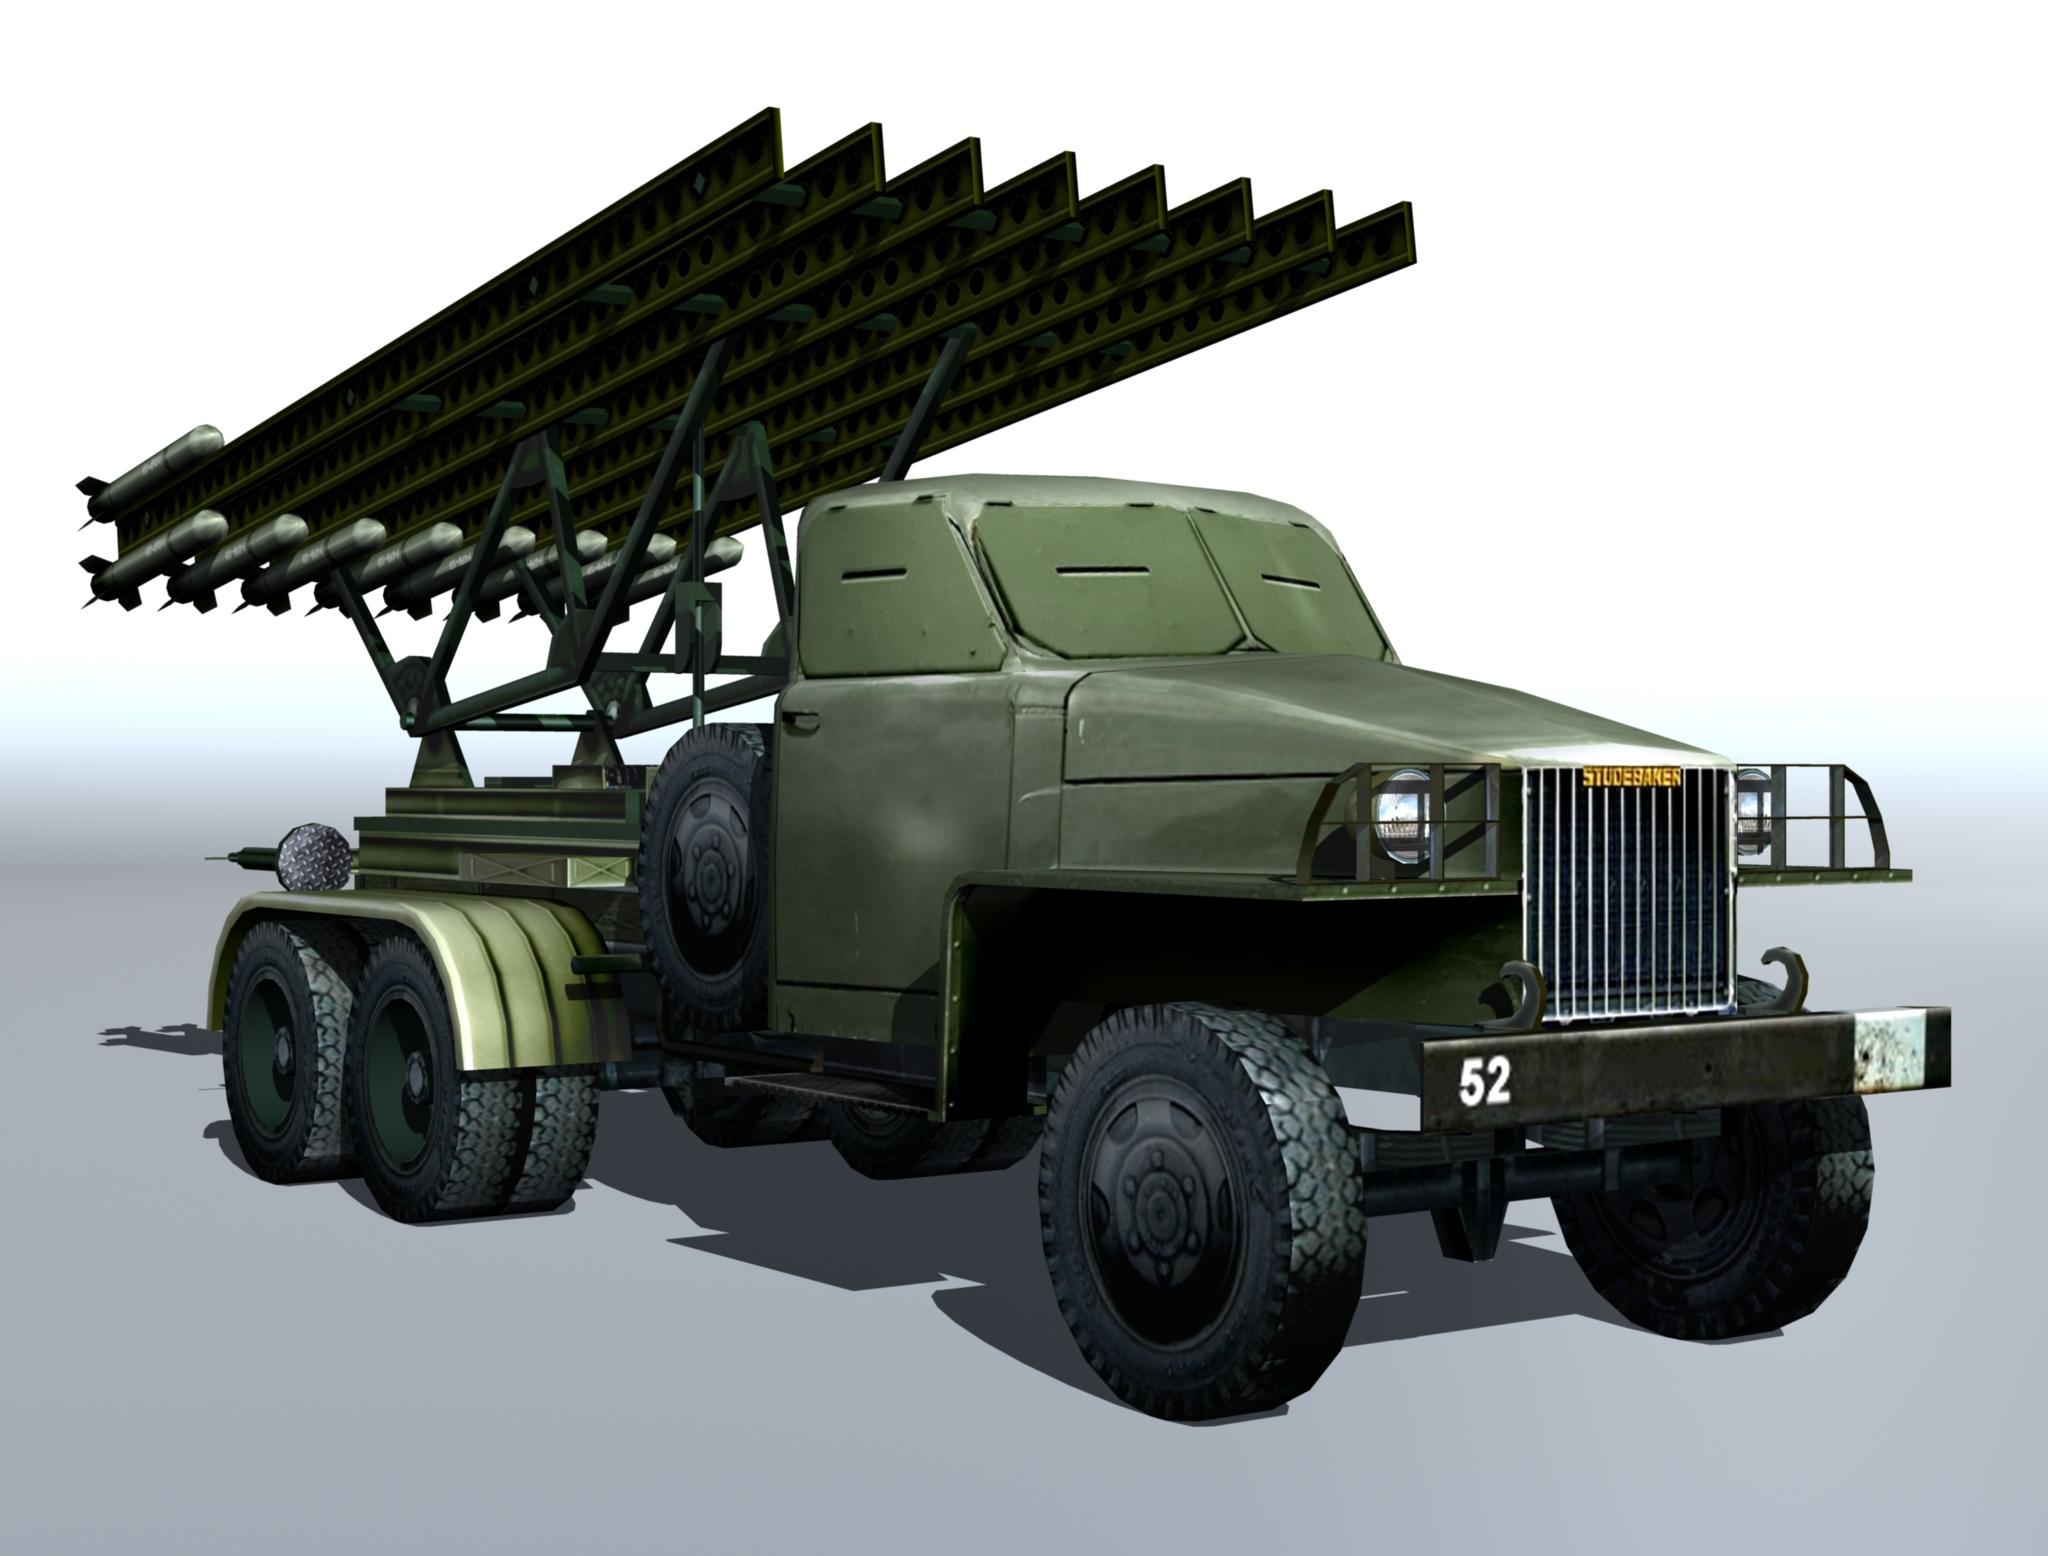 bm-13 - пуужингийн суулгац пуужингийн 'katusha'. 3d загвар 3ds max fbx obj 213992